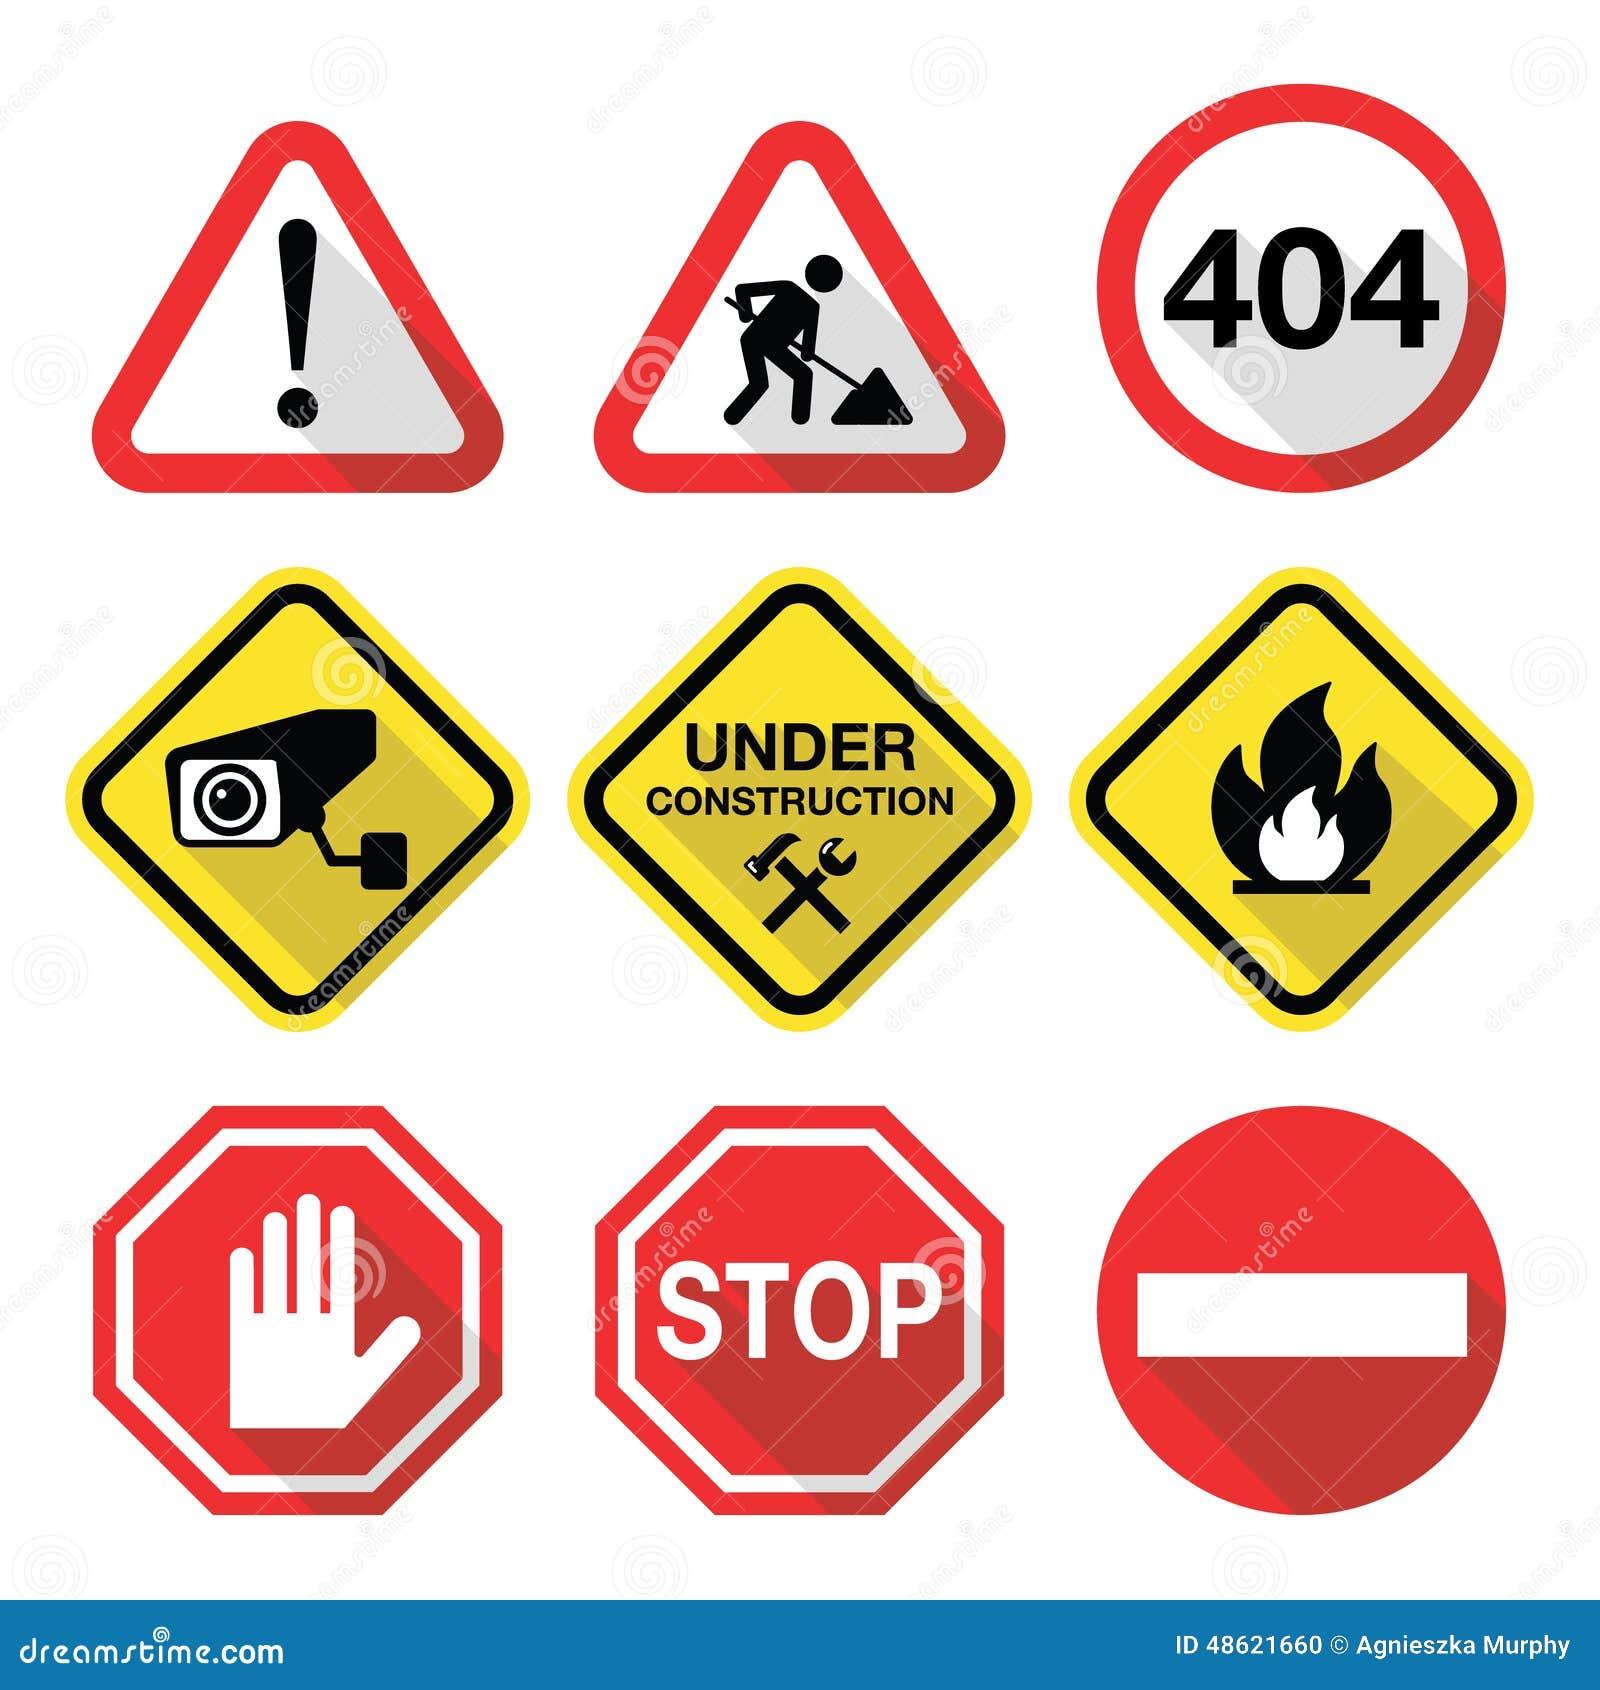 Warning Signs - Danger, Risk, Stress - Flat Design Stock Illustration ... Under Construction Signs